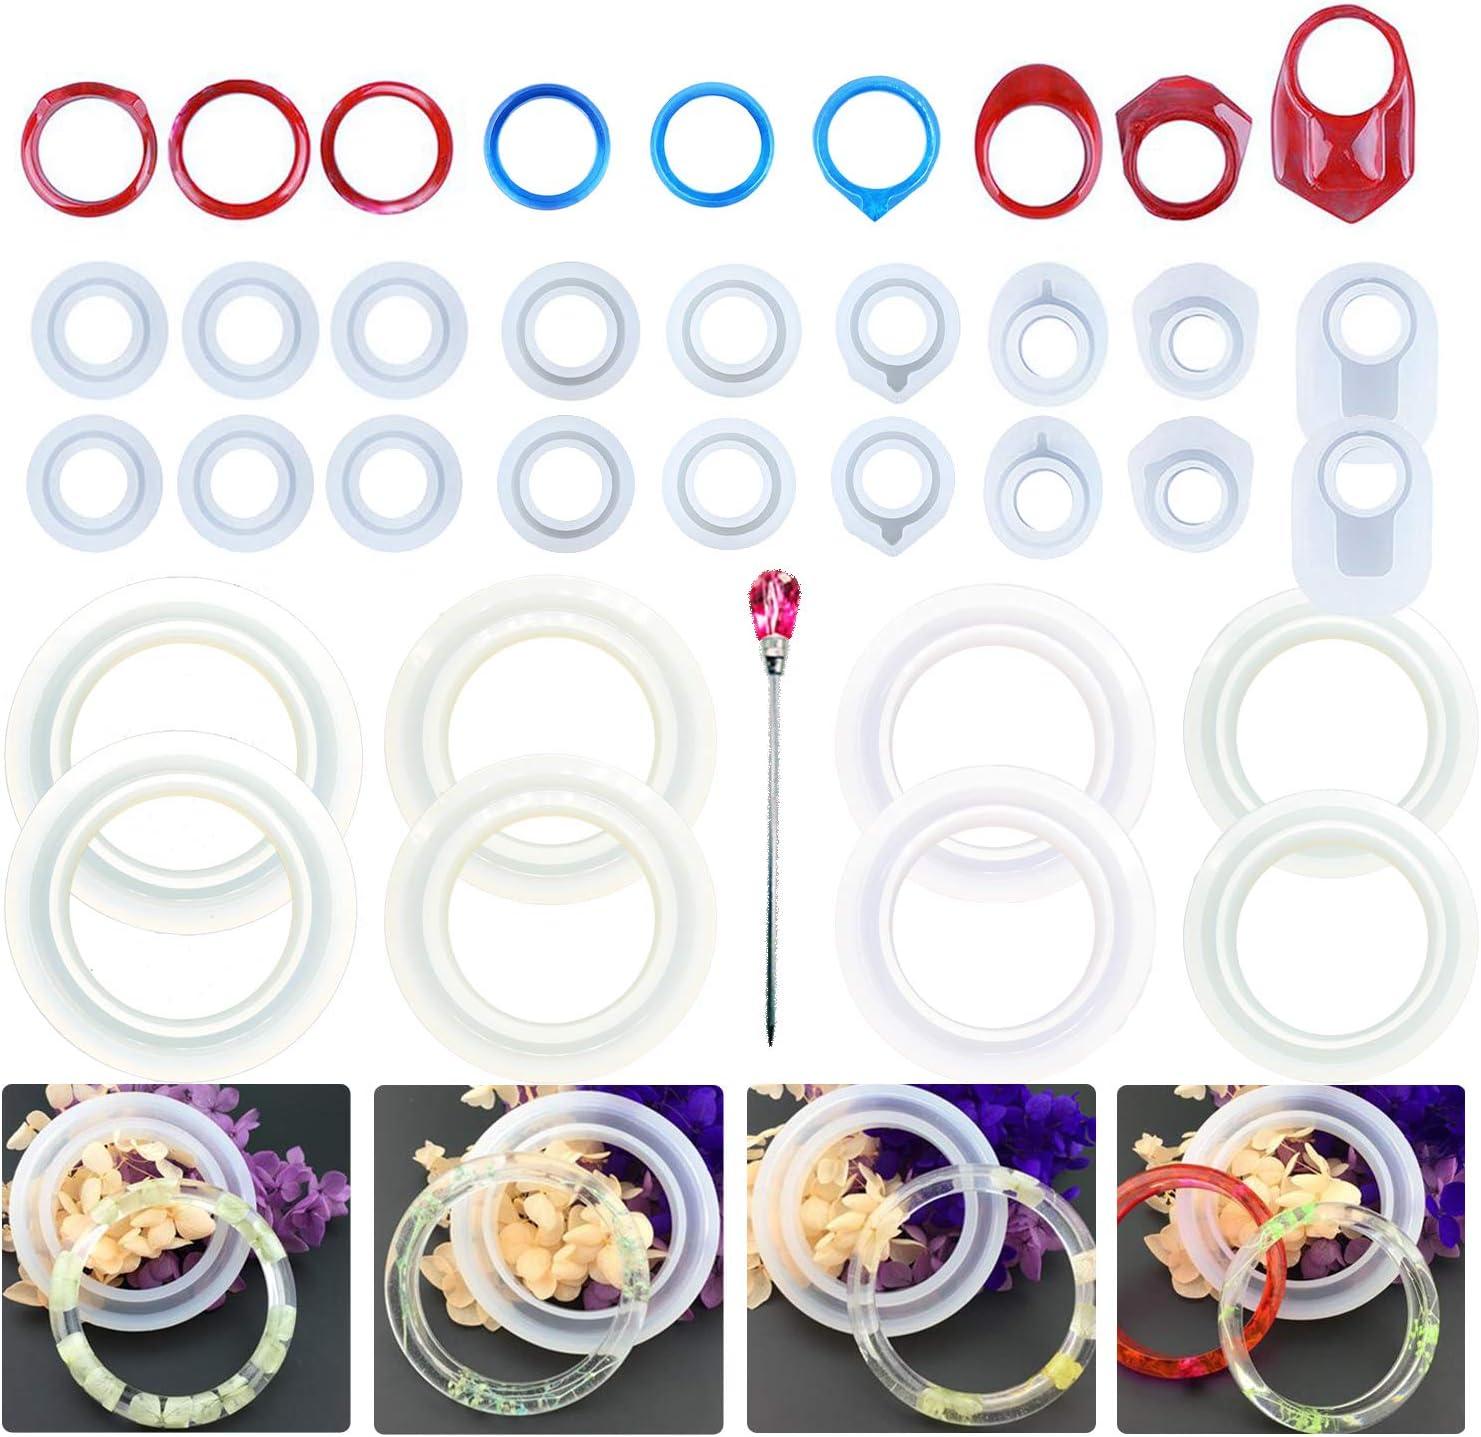 Allazone 32 Pz Molde Silicona Resina Anillo Pulsera Joyería Collar Joya Pendiente Fabricación de Colgante Creativo Bricolaje DIY